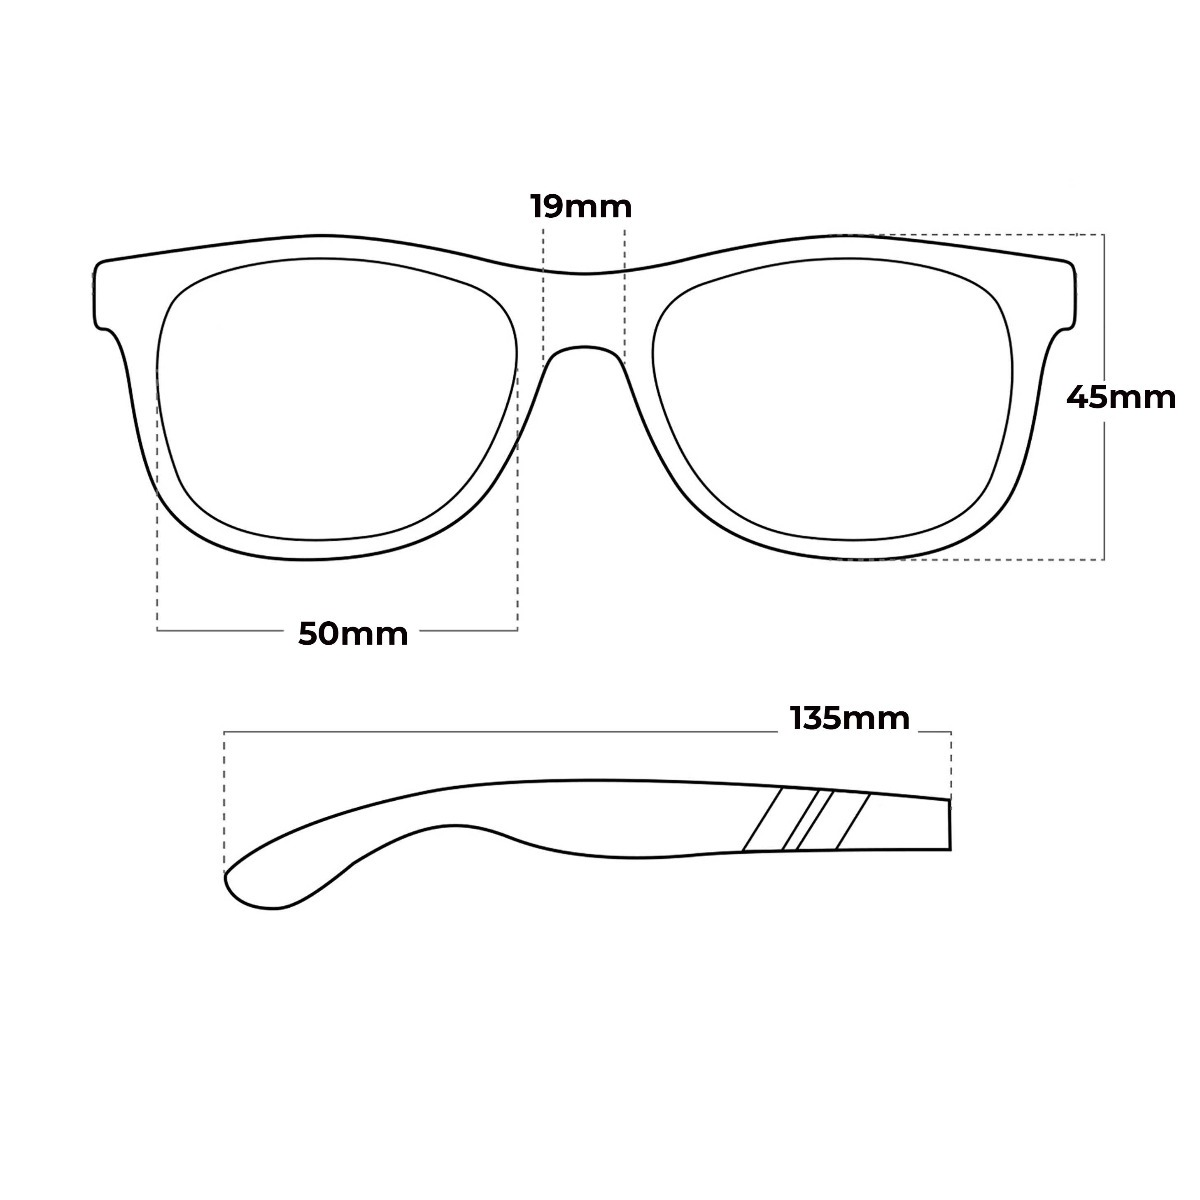 8b40f28f869f6 Óculos De Sol Bulget - Bg5092 T01 - Verde - R  199,99 em Mercado Livre